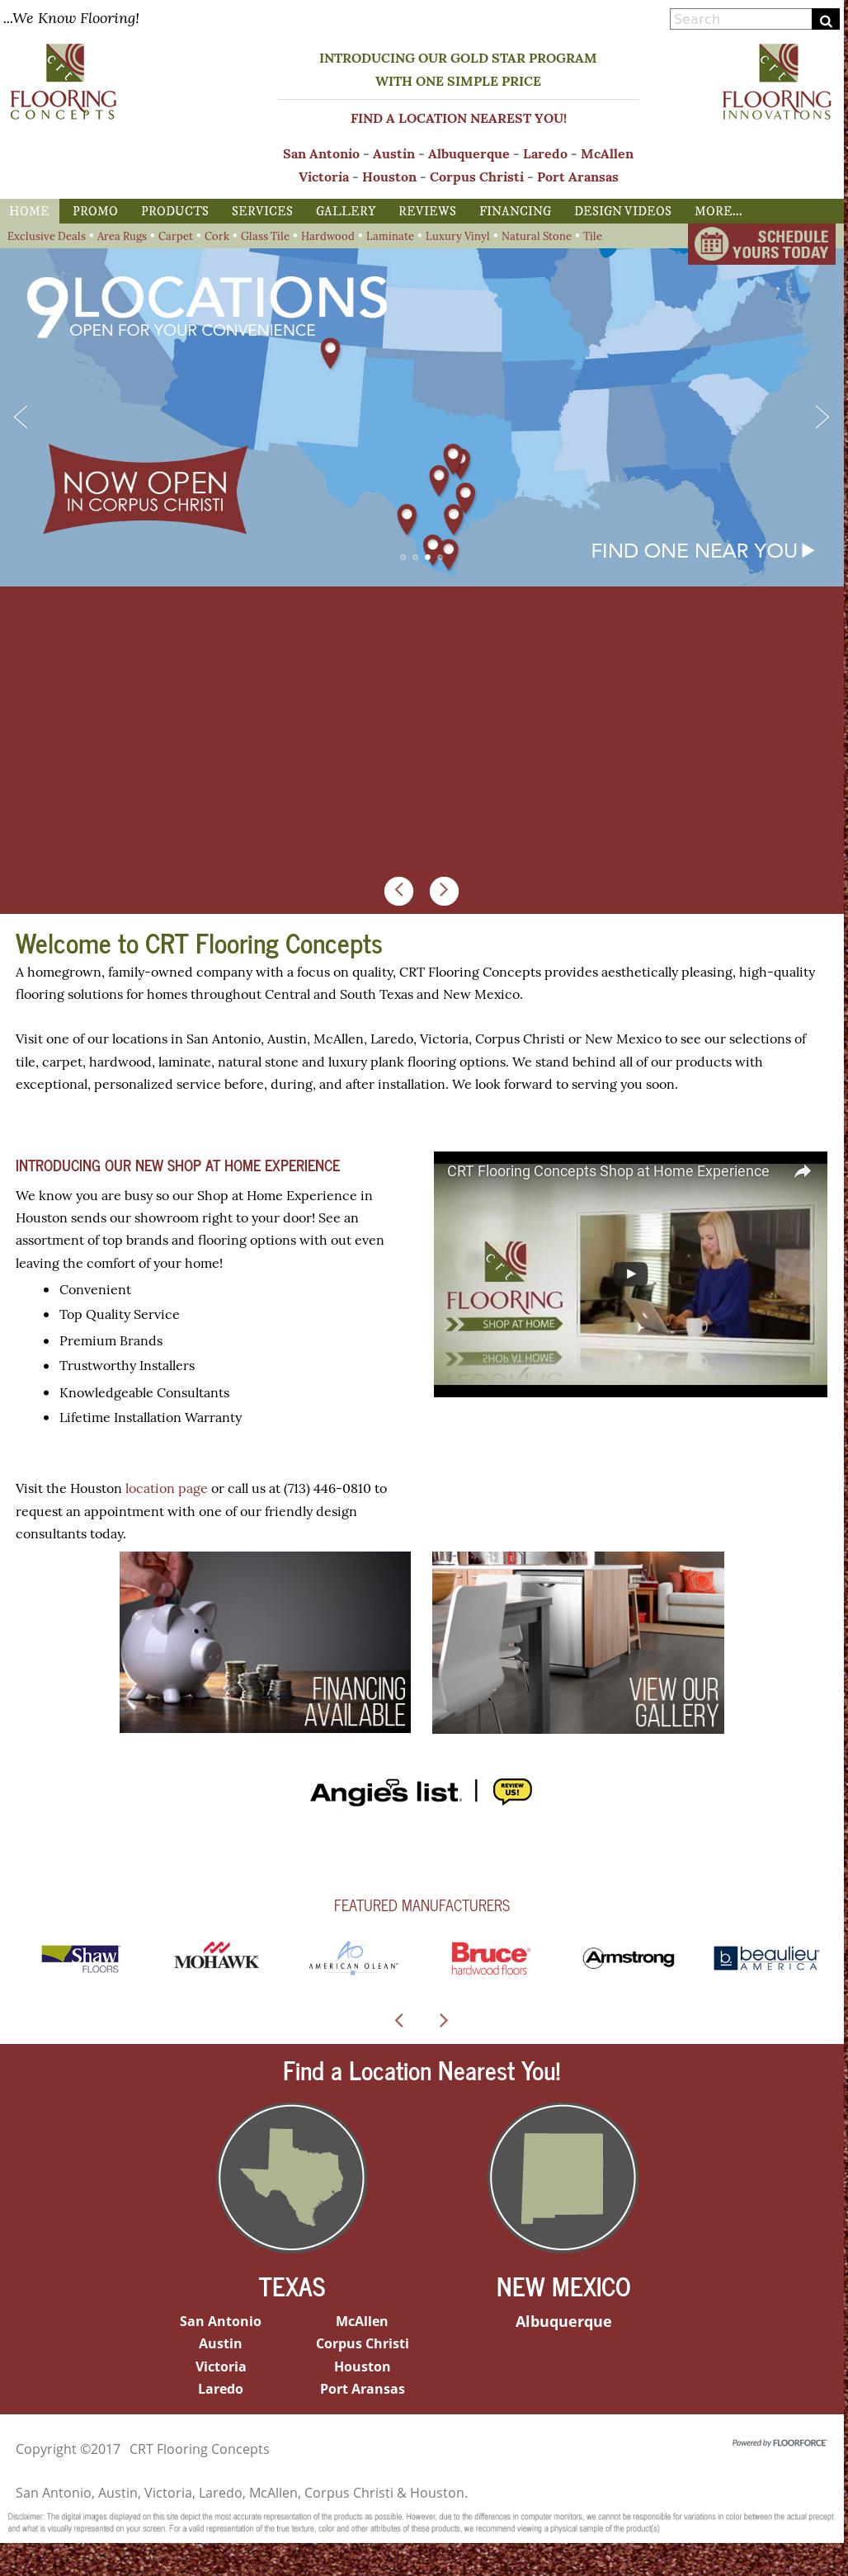 Crt Flooring Concepts Website History